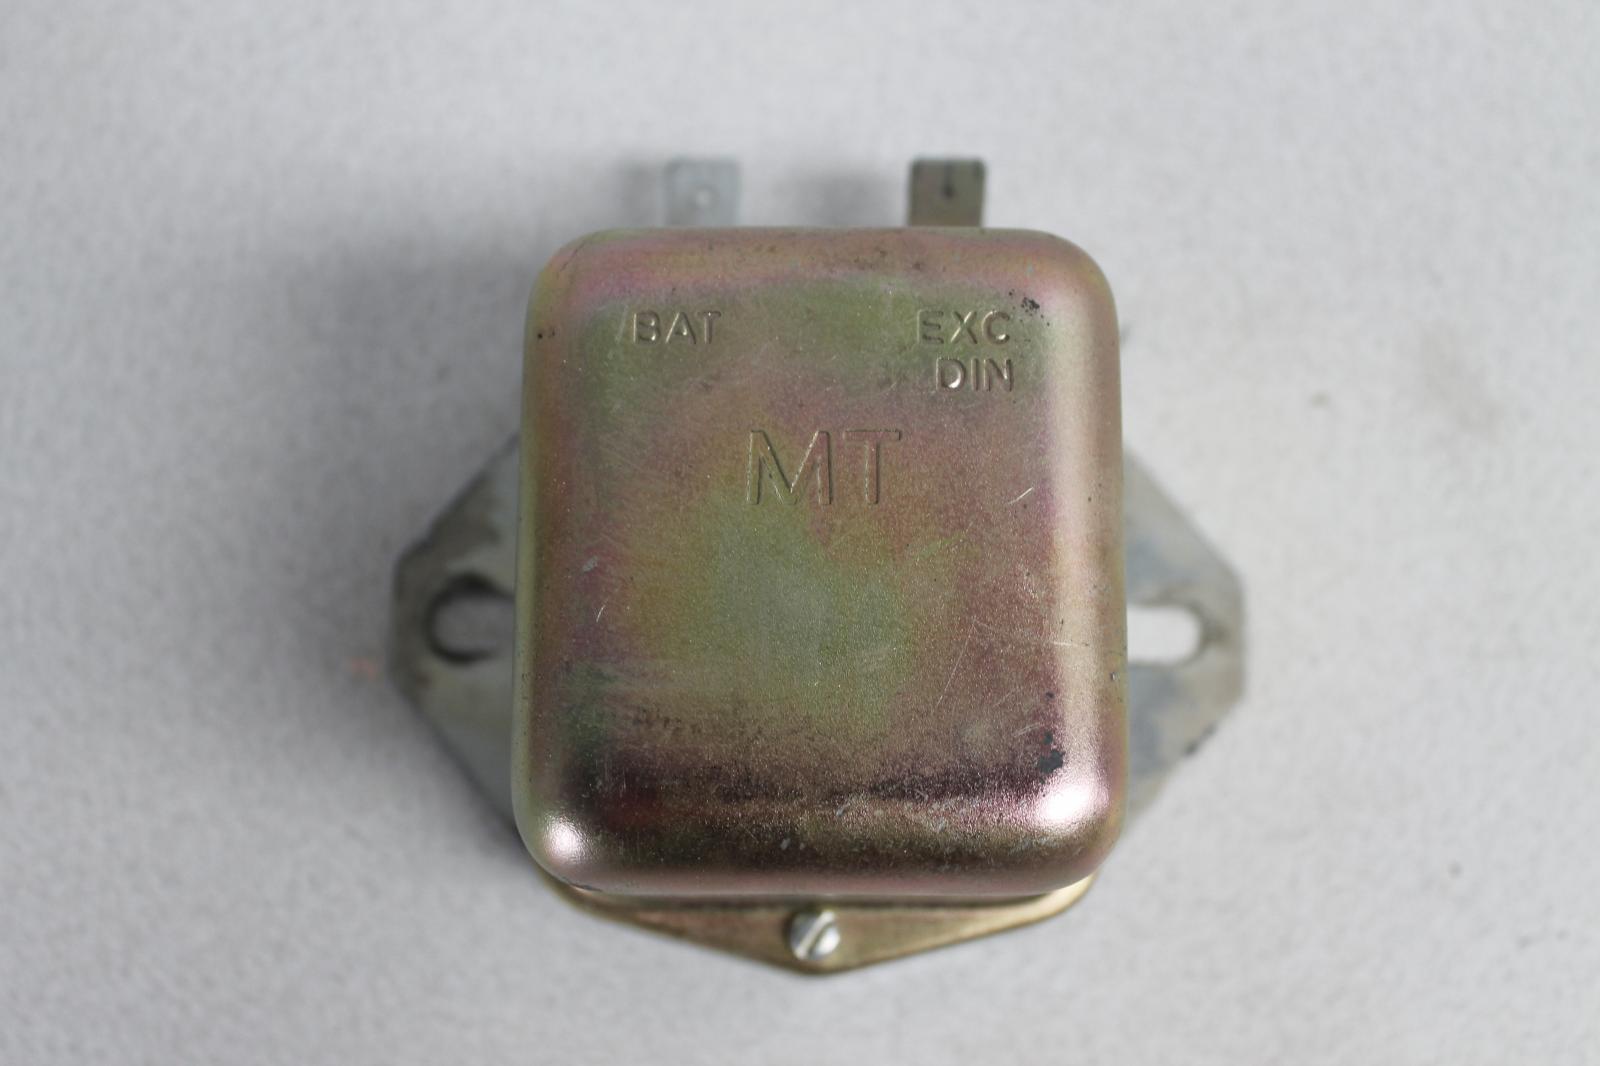 MONREVIL RM-300